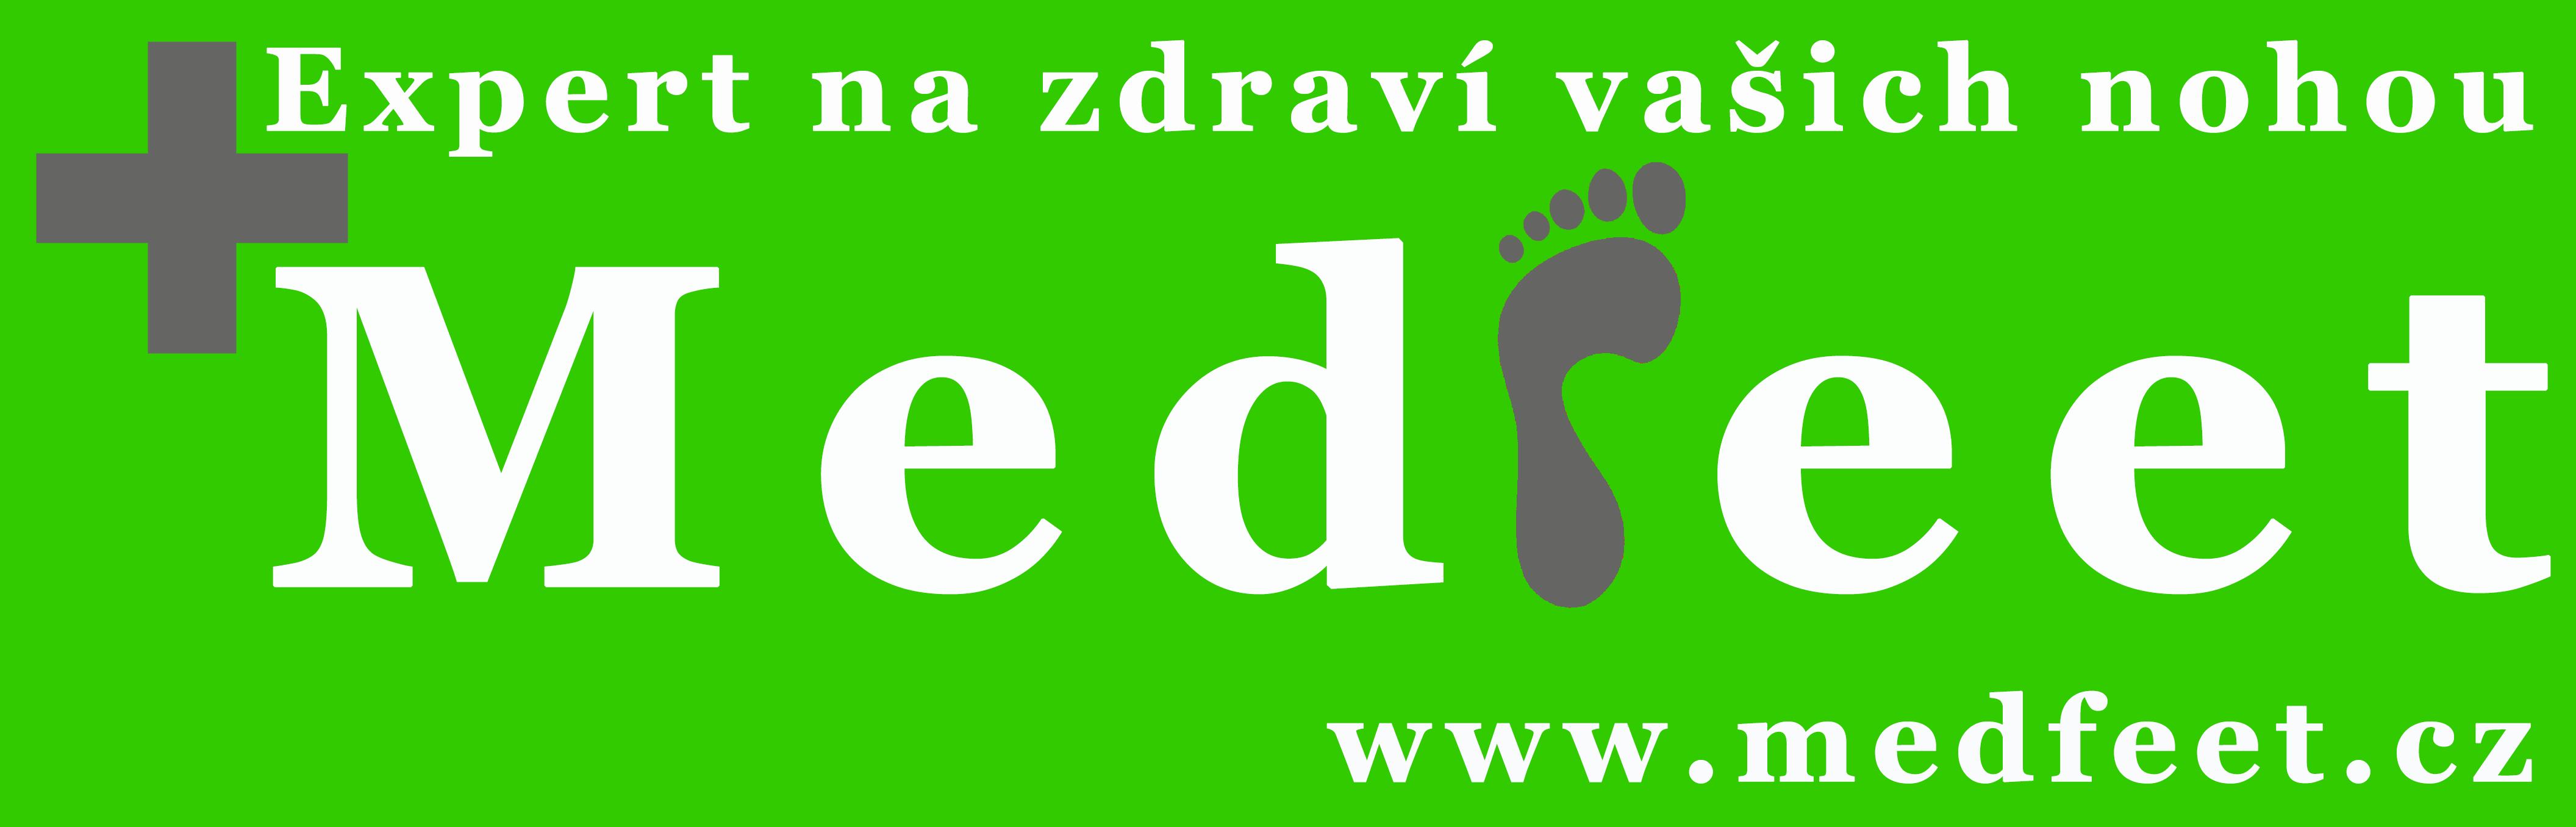 MedFeet.cz